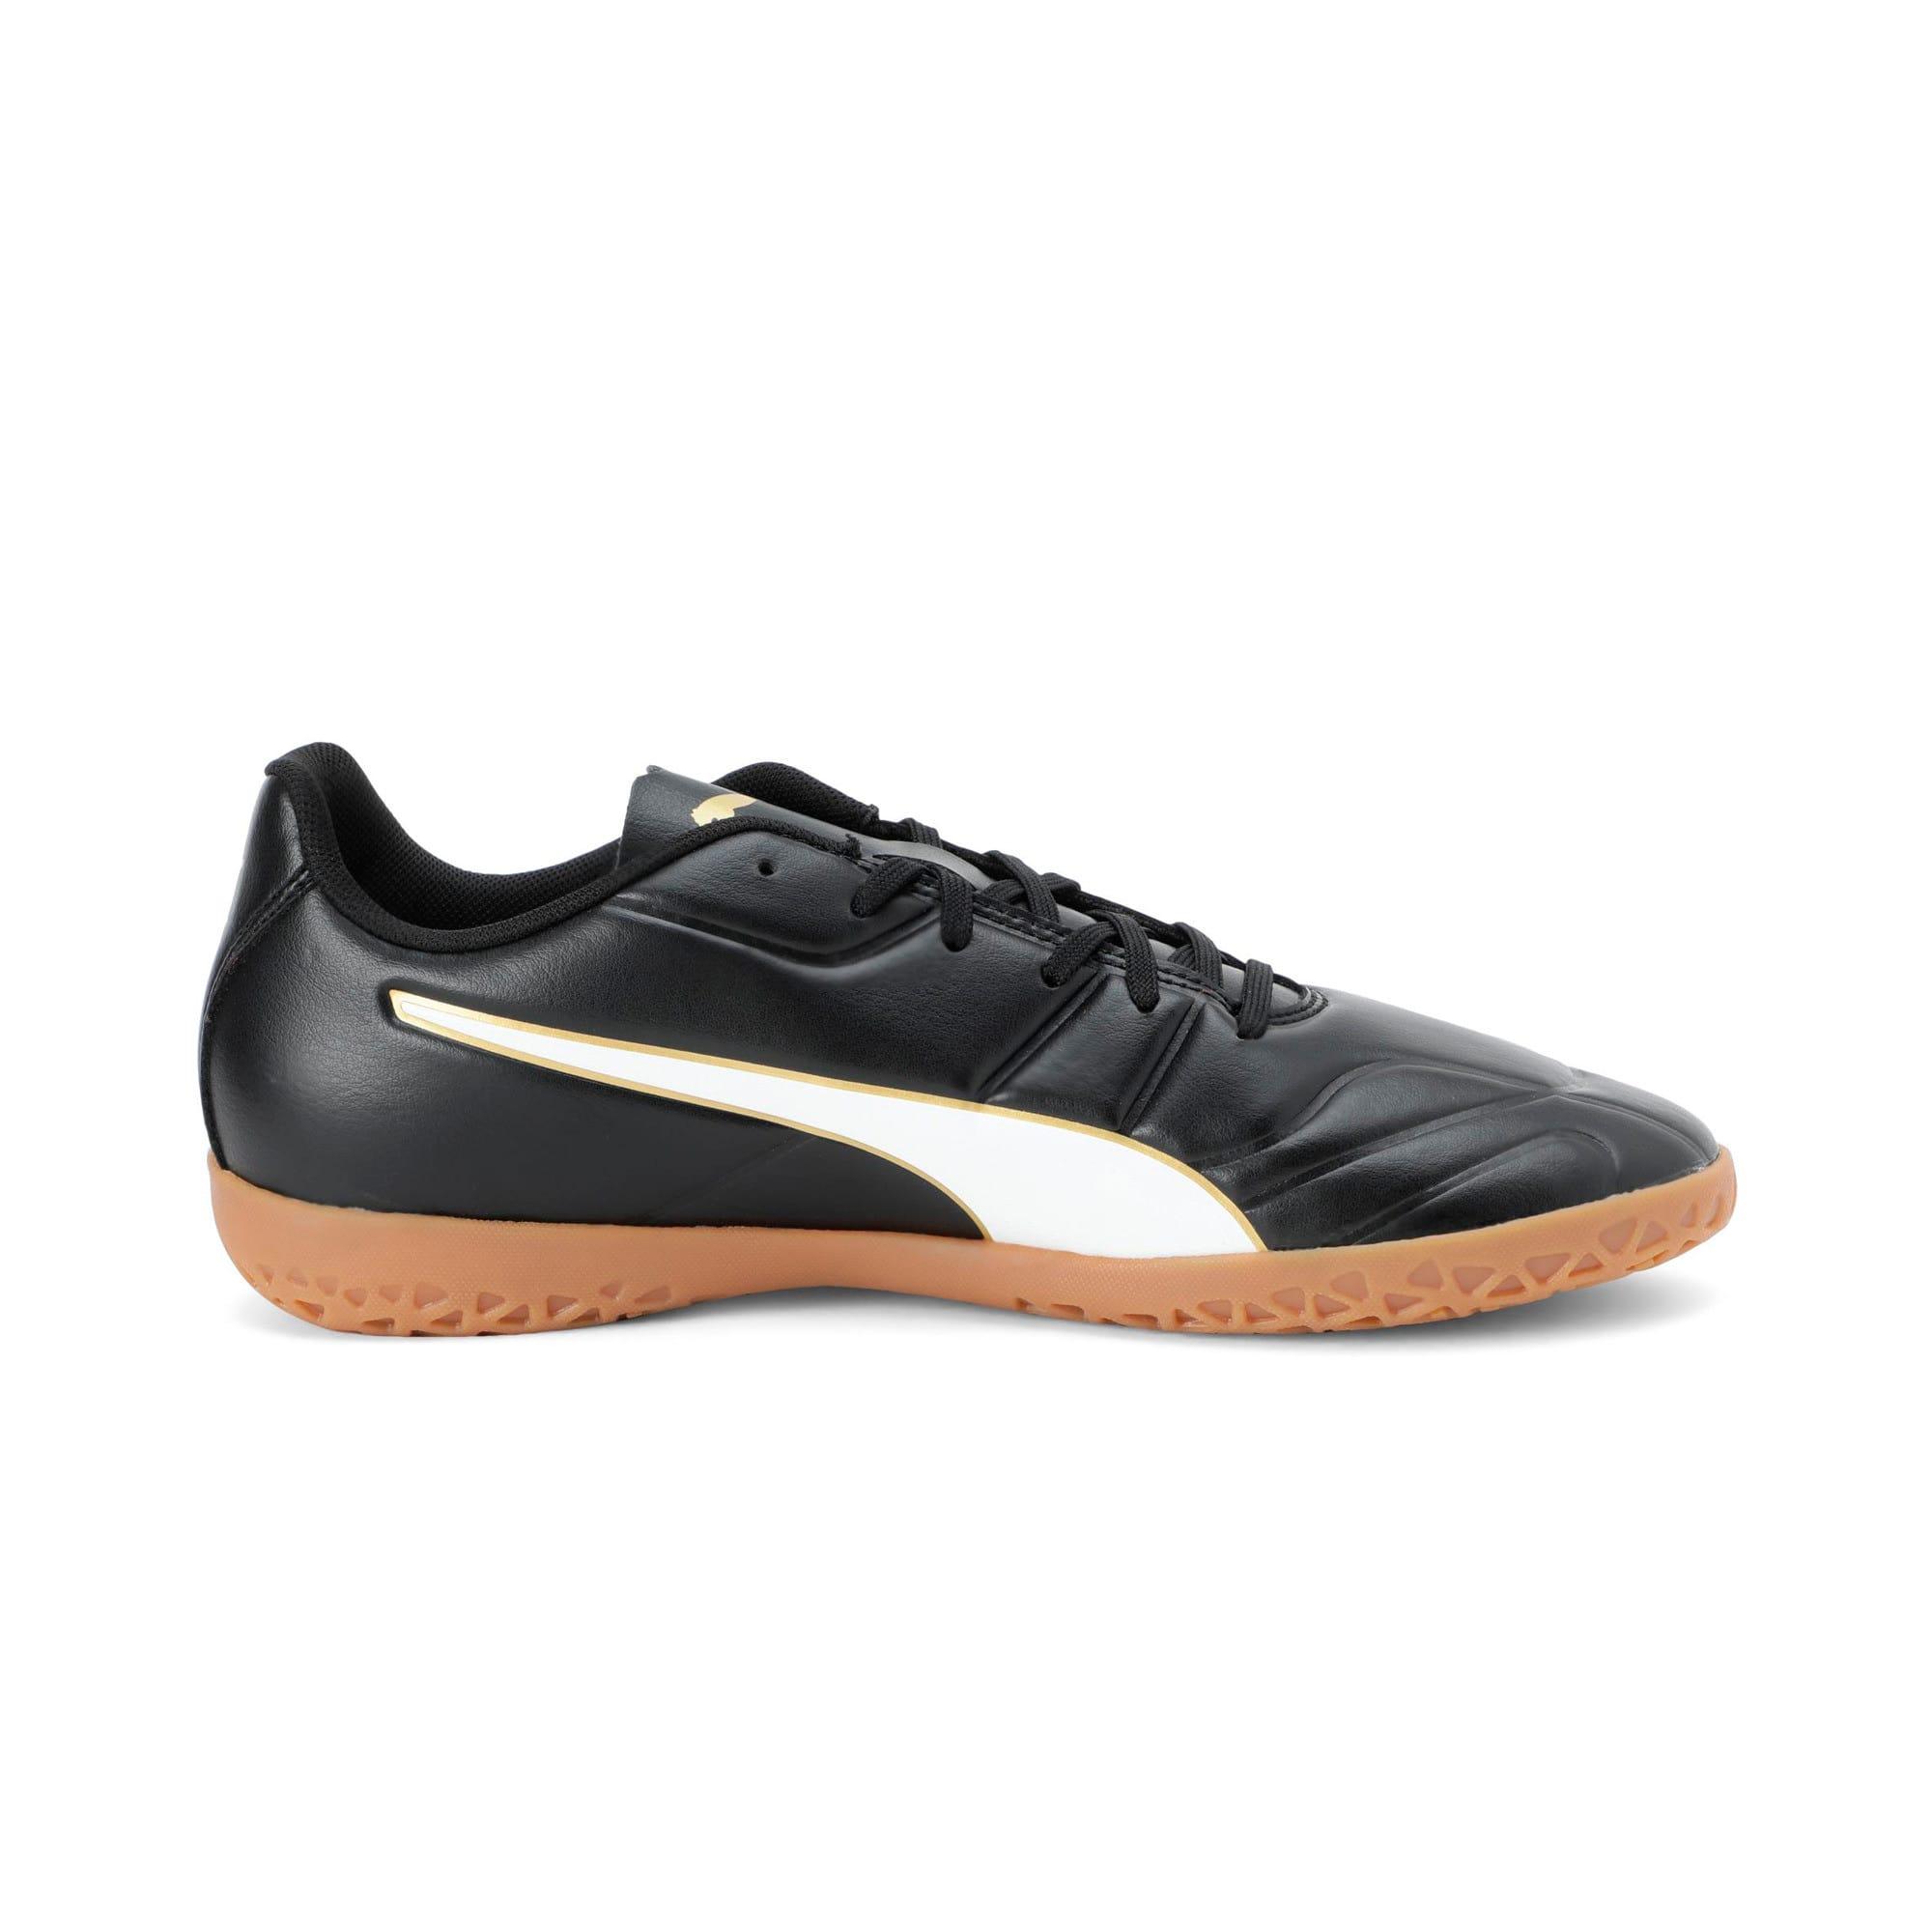 Thumbnail 5 of Classico C II Men's Football Boots, Puma Black-Puma White-Gold, medium-IND